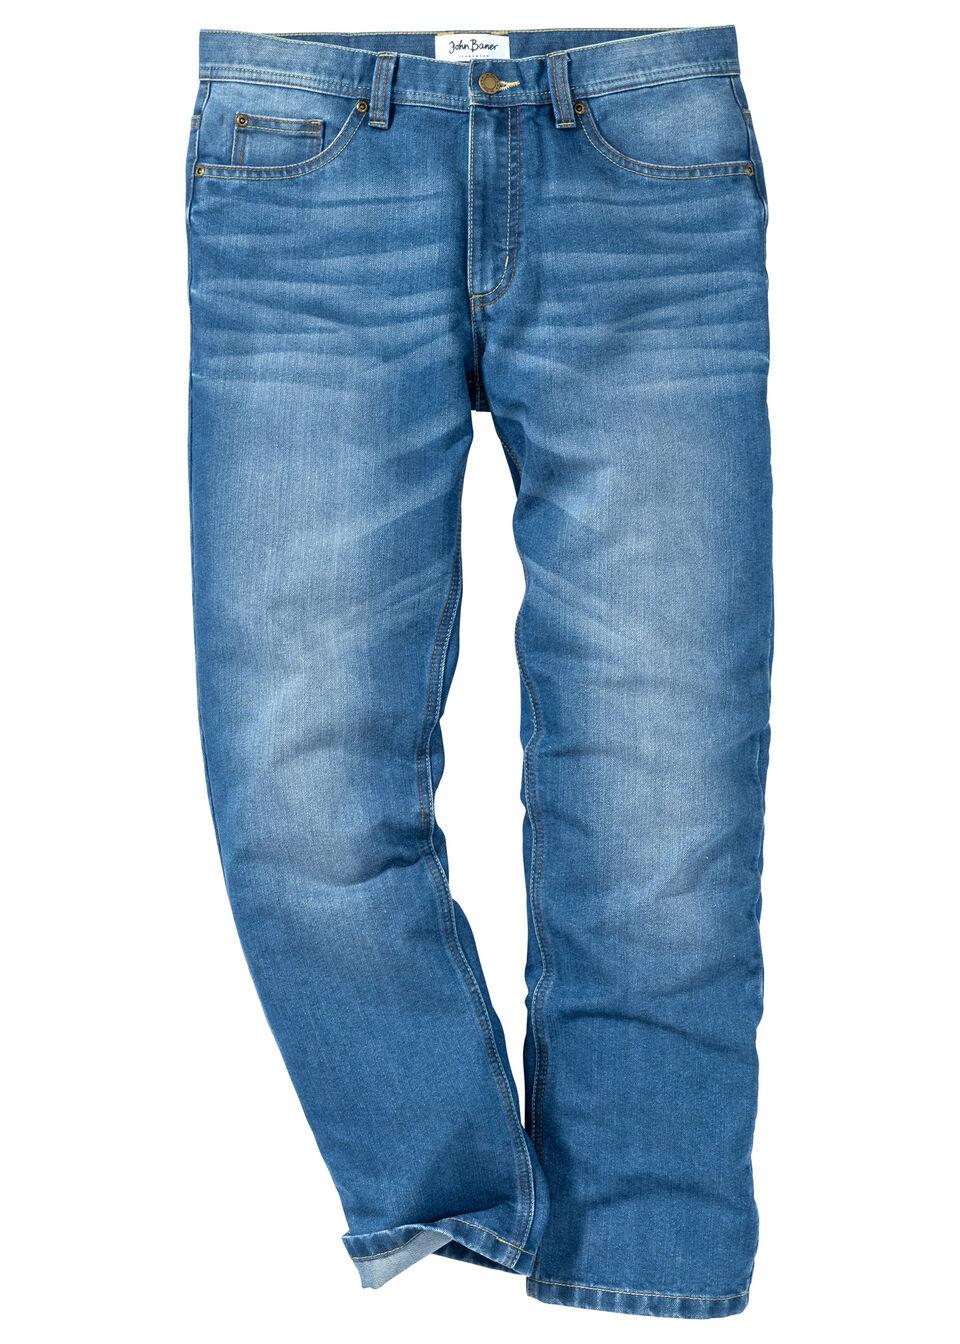 Jeanși Regular Fit Straight bonprix